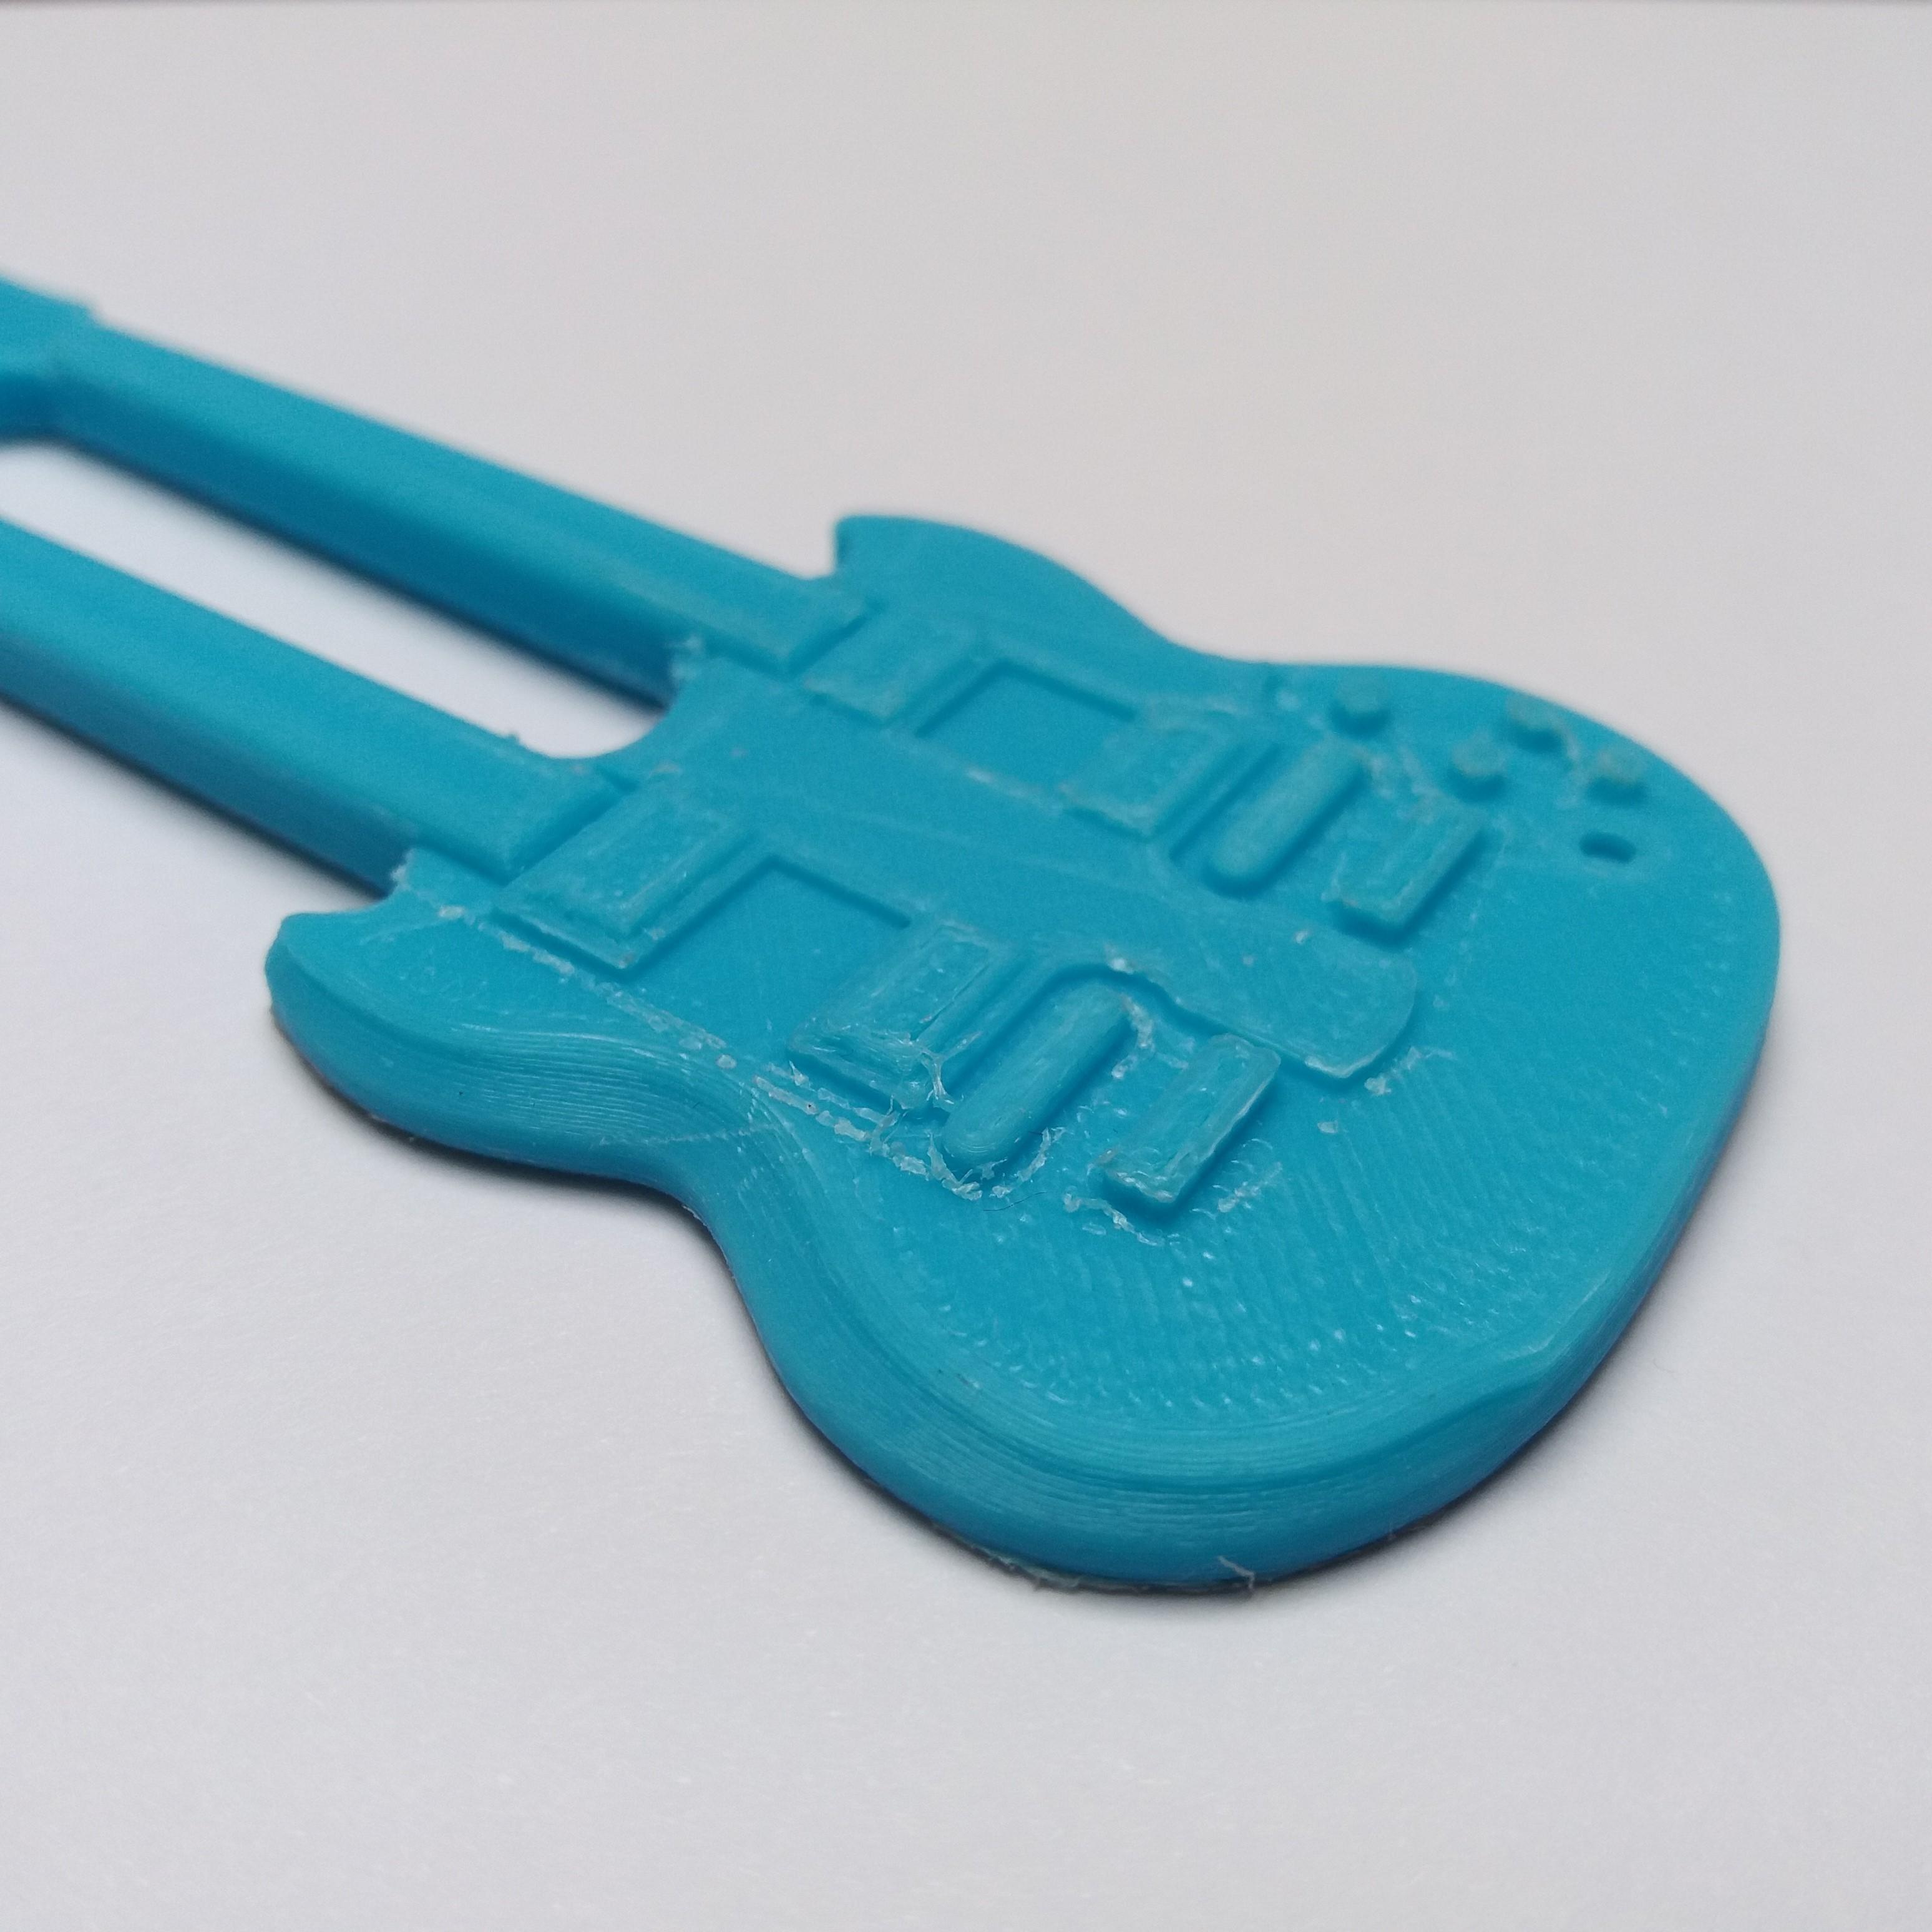 zoom gauche.jpg Download free STL file Gibson-custom double-neck guitar • 3D print object, gerbat